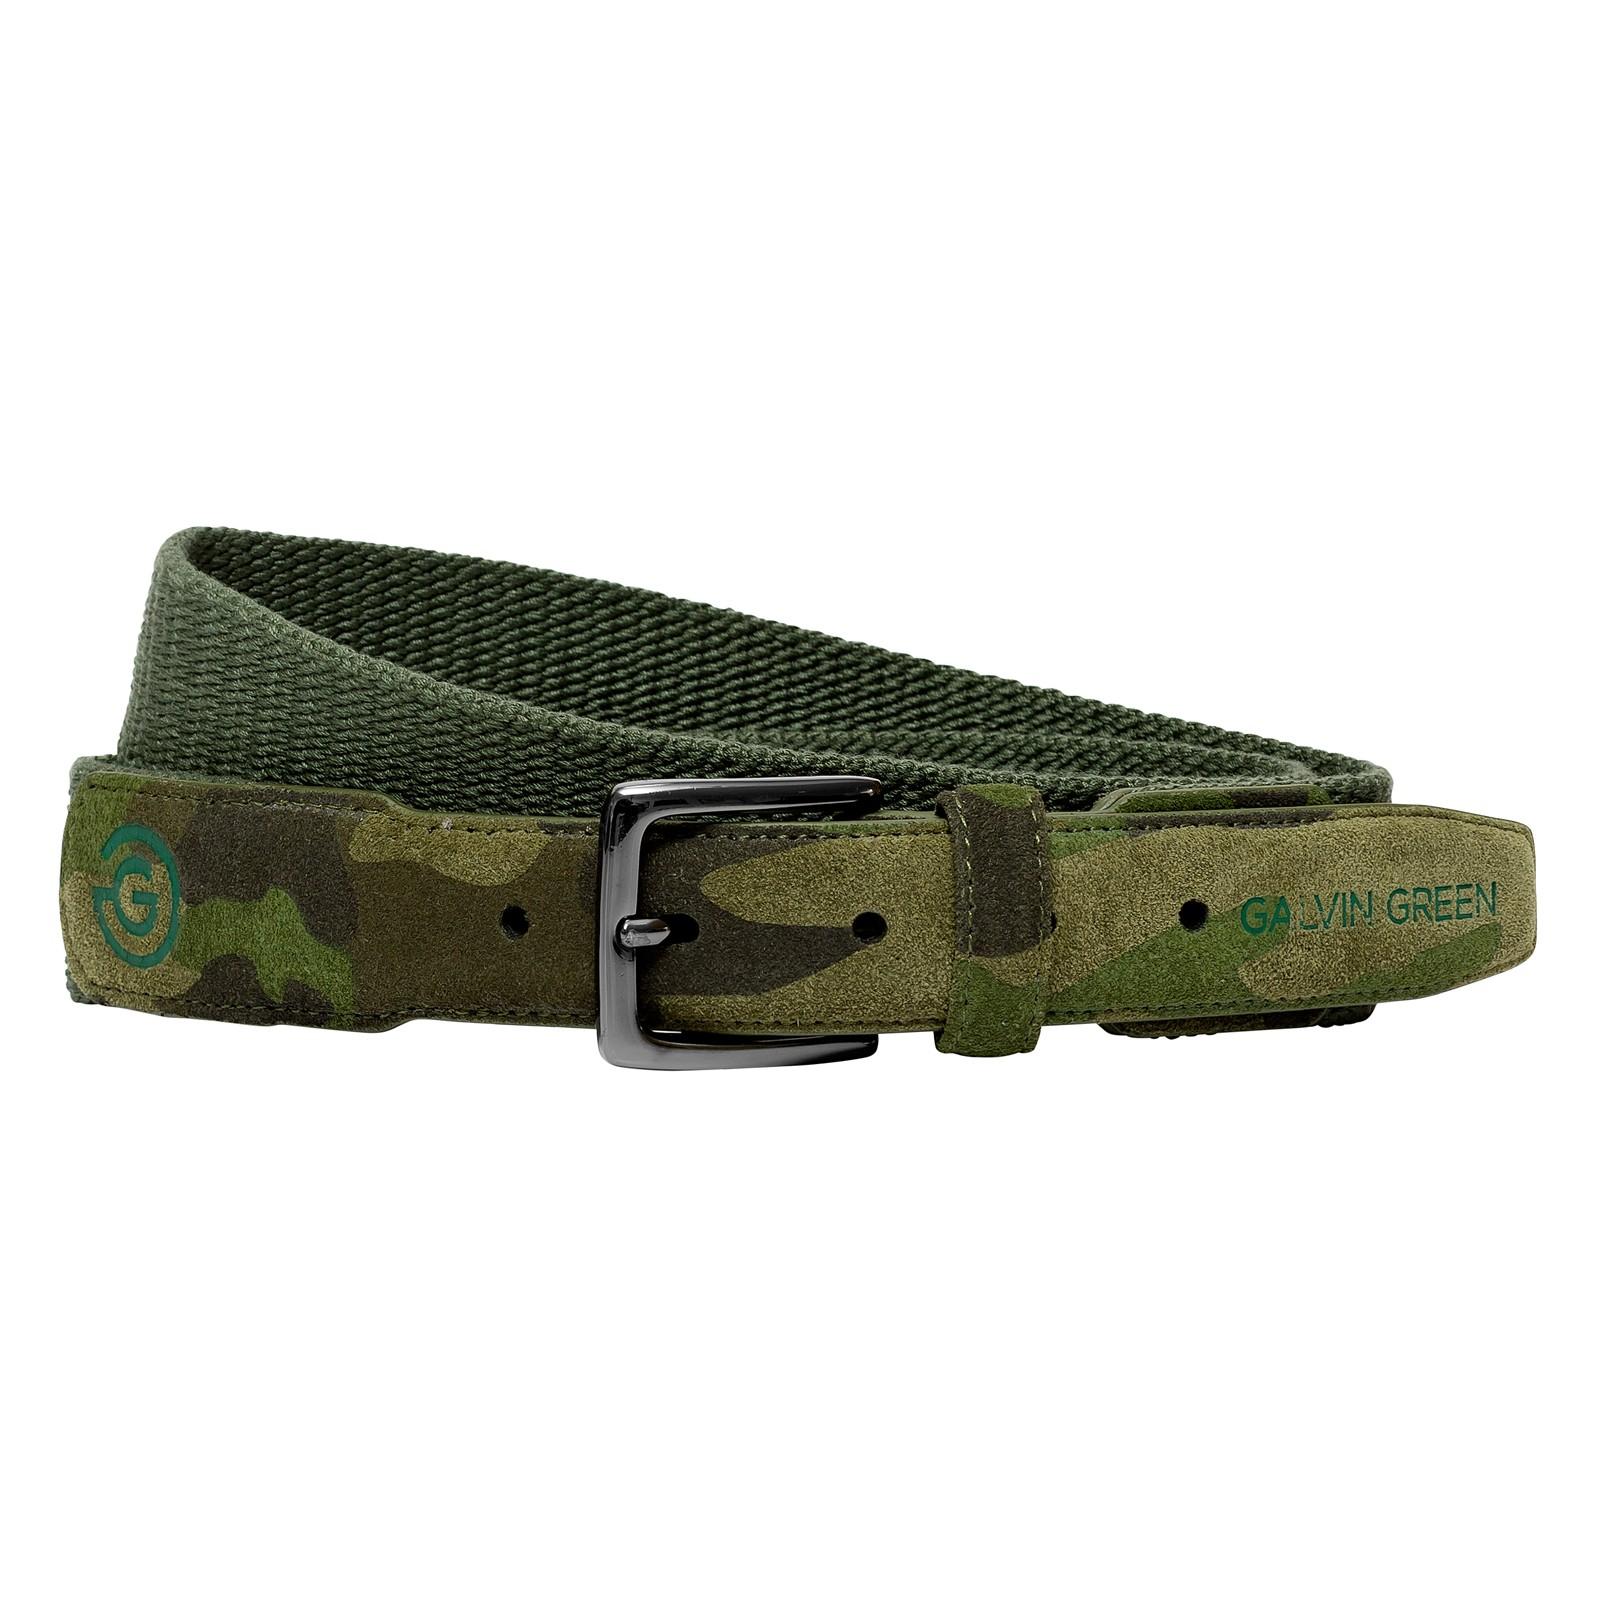 Galvin Green E-Camo Belt